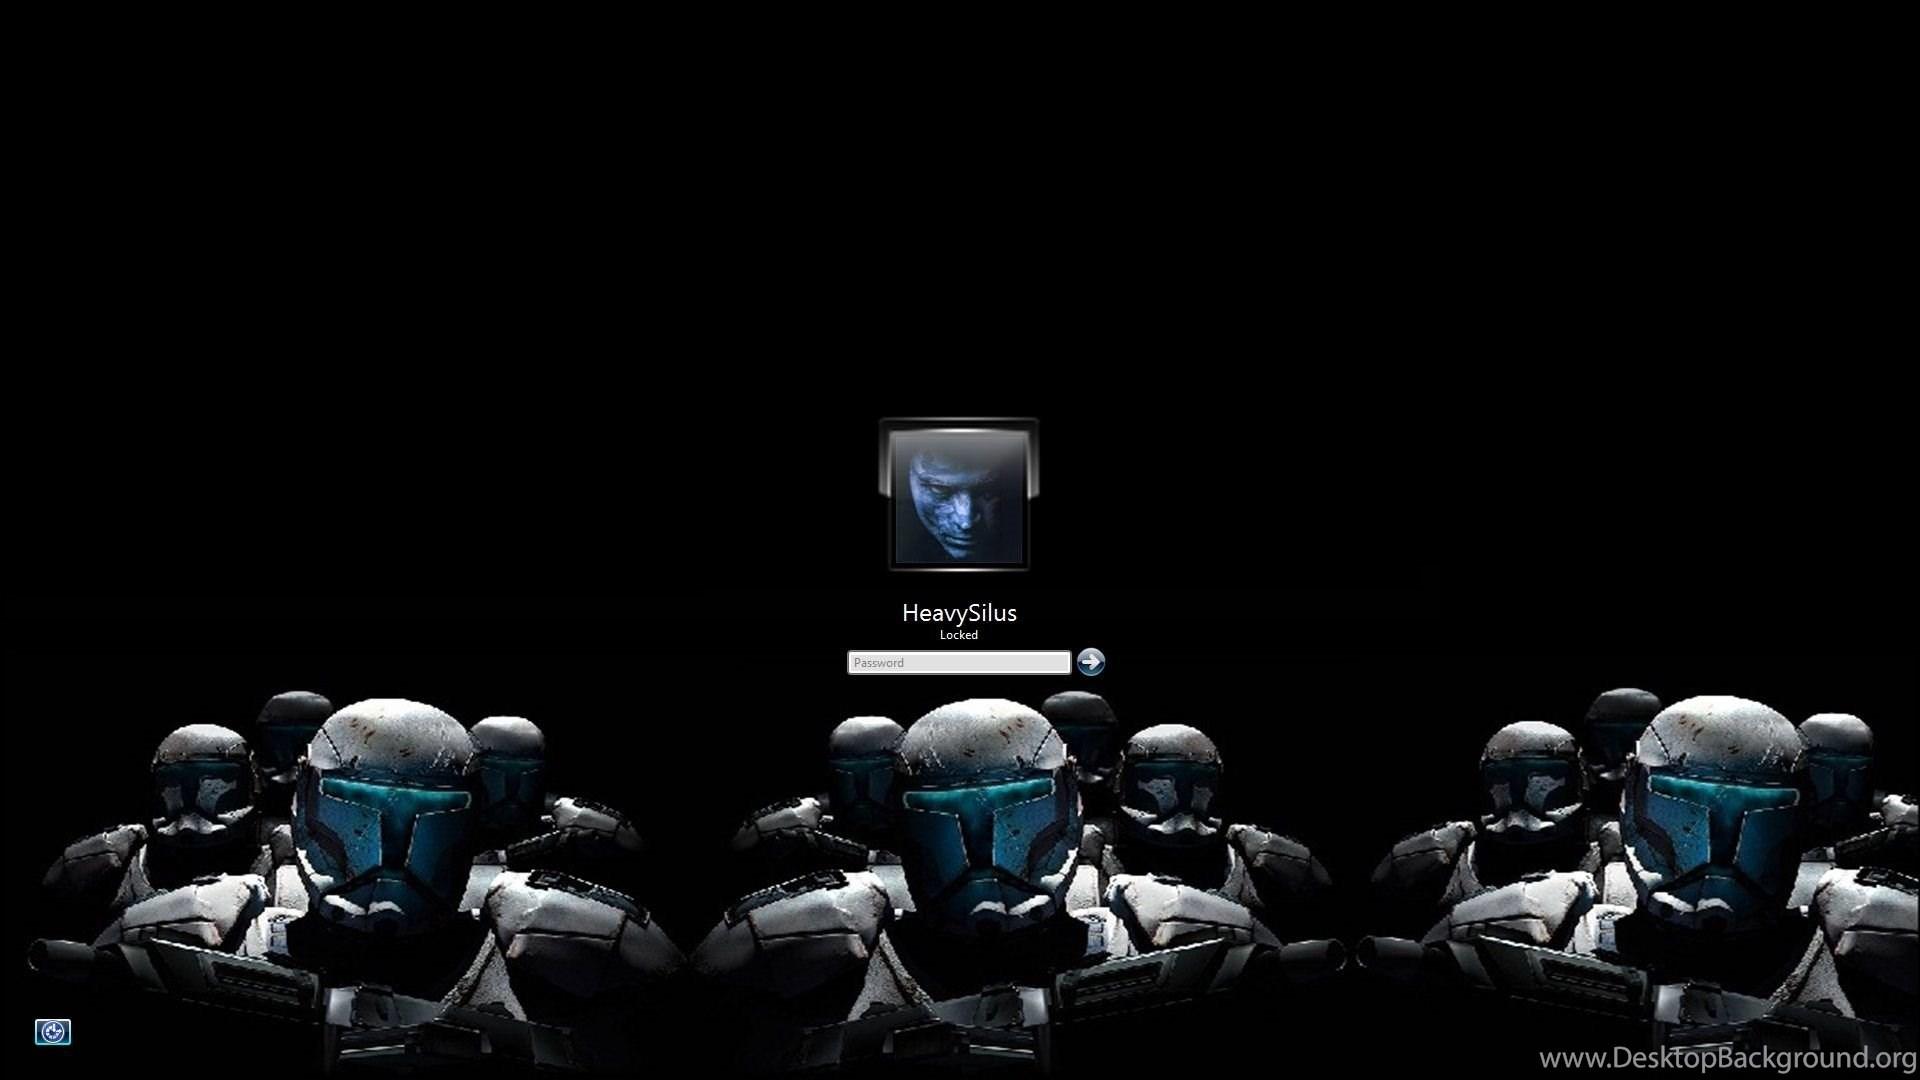 Star Wars Republic Commando 1359762 Desktop Background